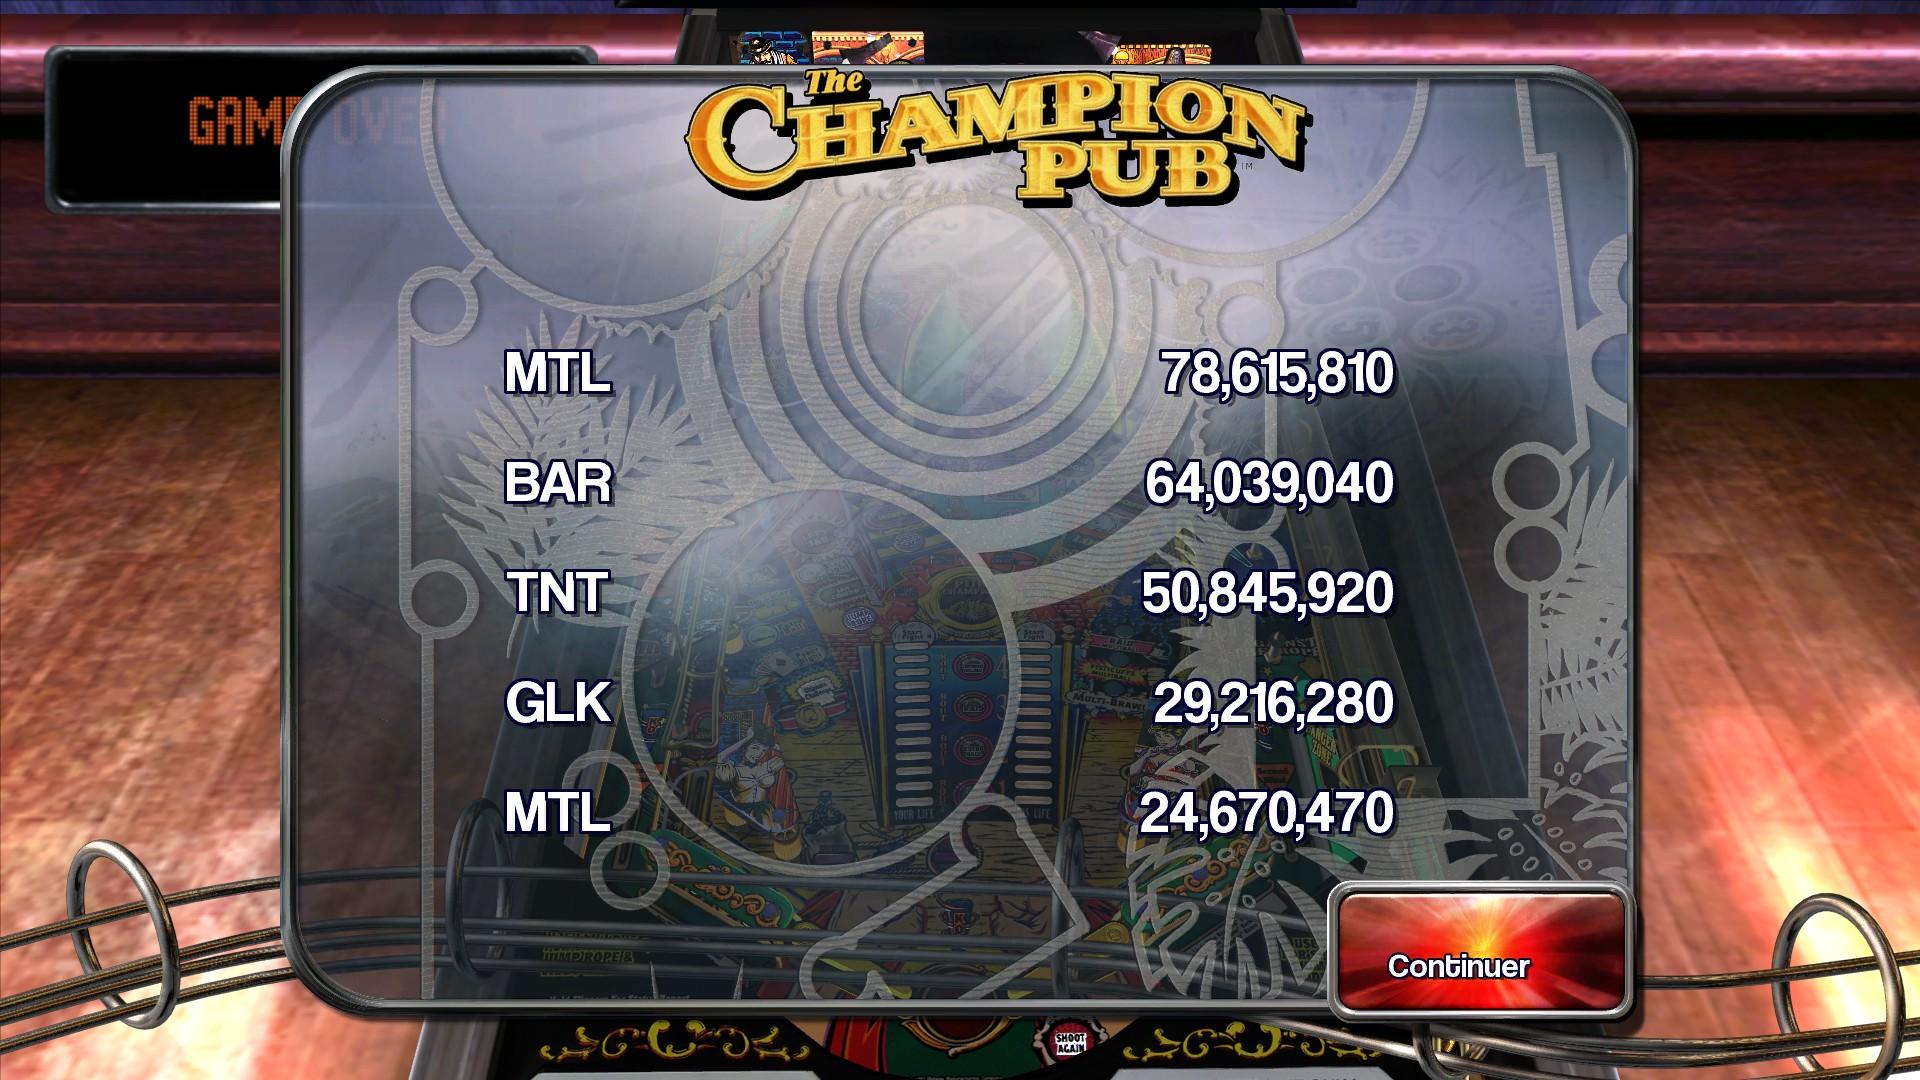 Mantalow: Pinball Arcade: The Champion Pub (PC) 78,615,810 points on 2015-03-05 05:40:02